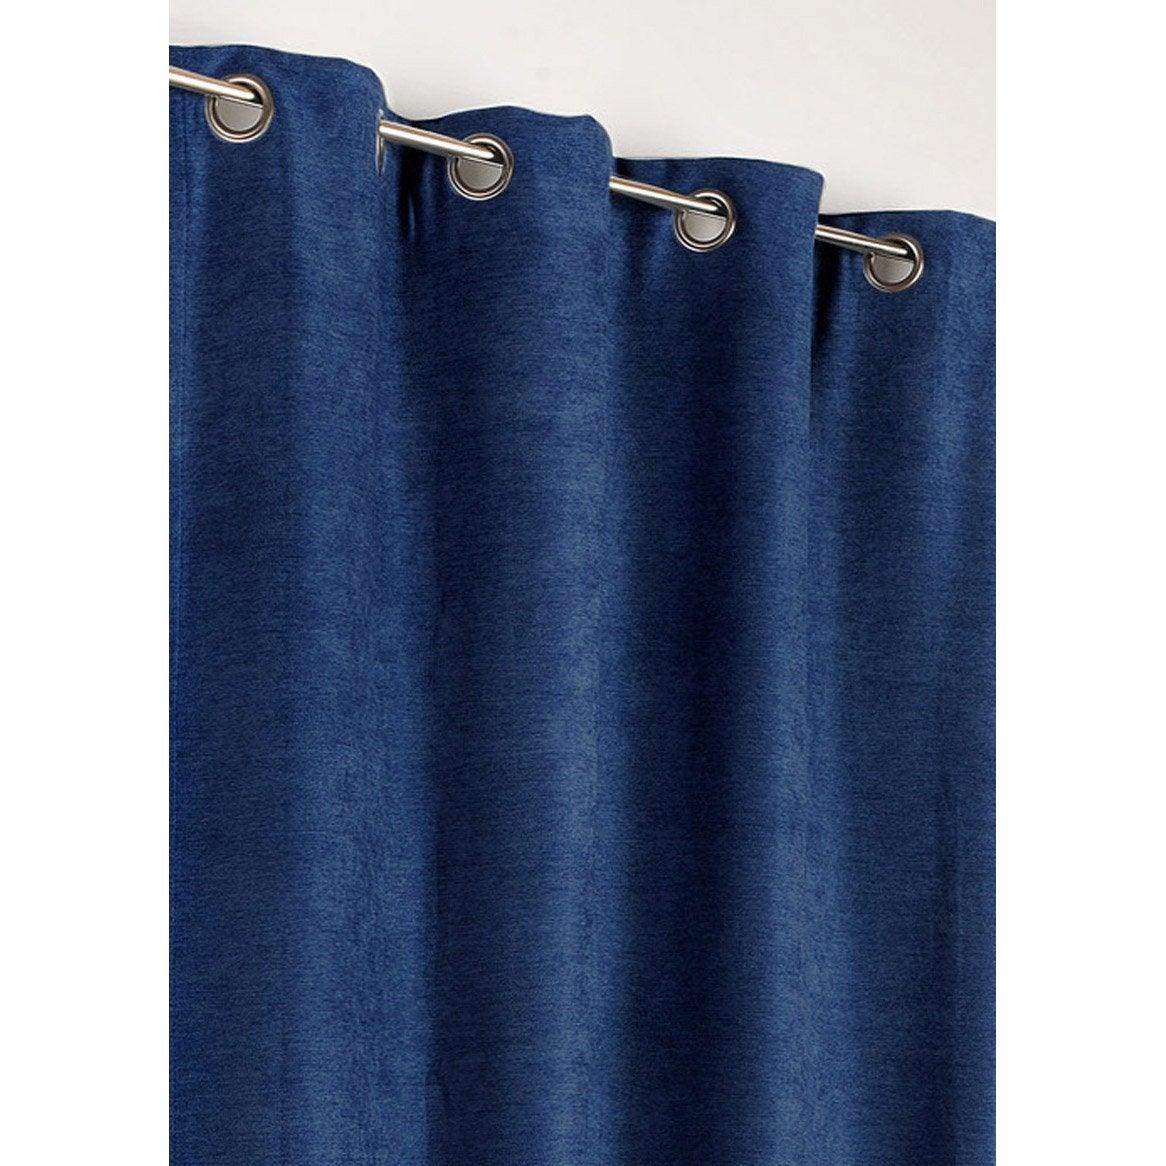 rideau occultant alaska bleu roi x cm. Black Bedroom Furniture Sets. Home Design Ideas